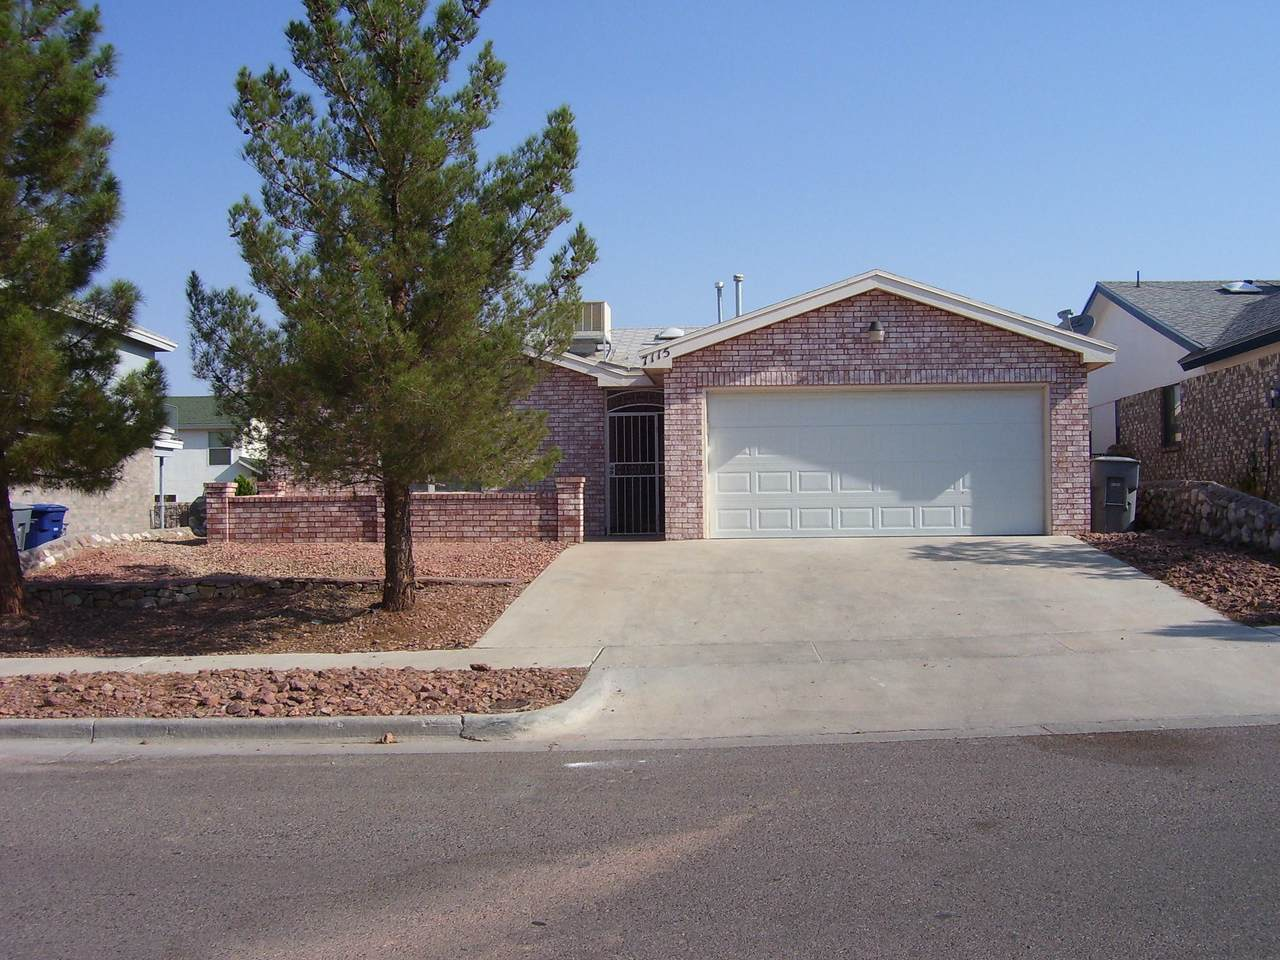 7115 Oval Rock Drive - Photo 1